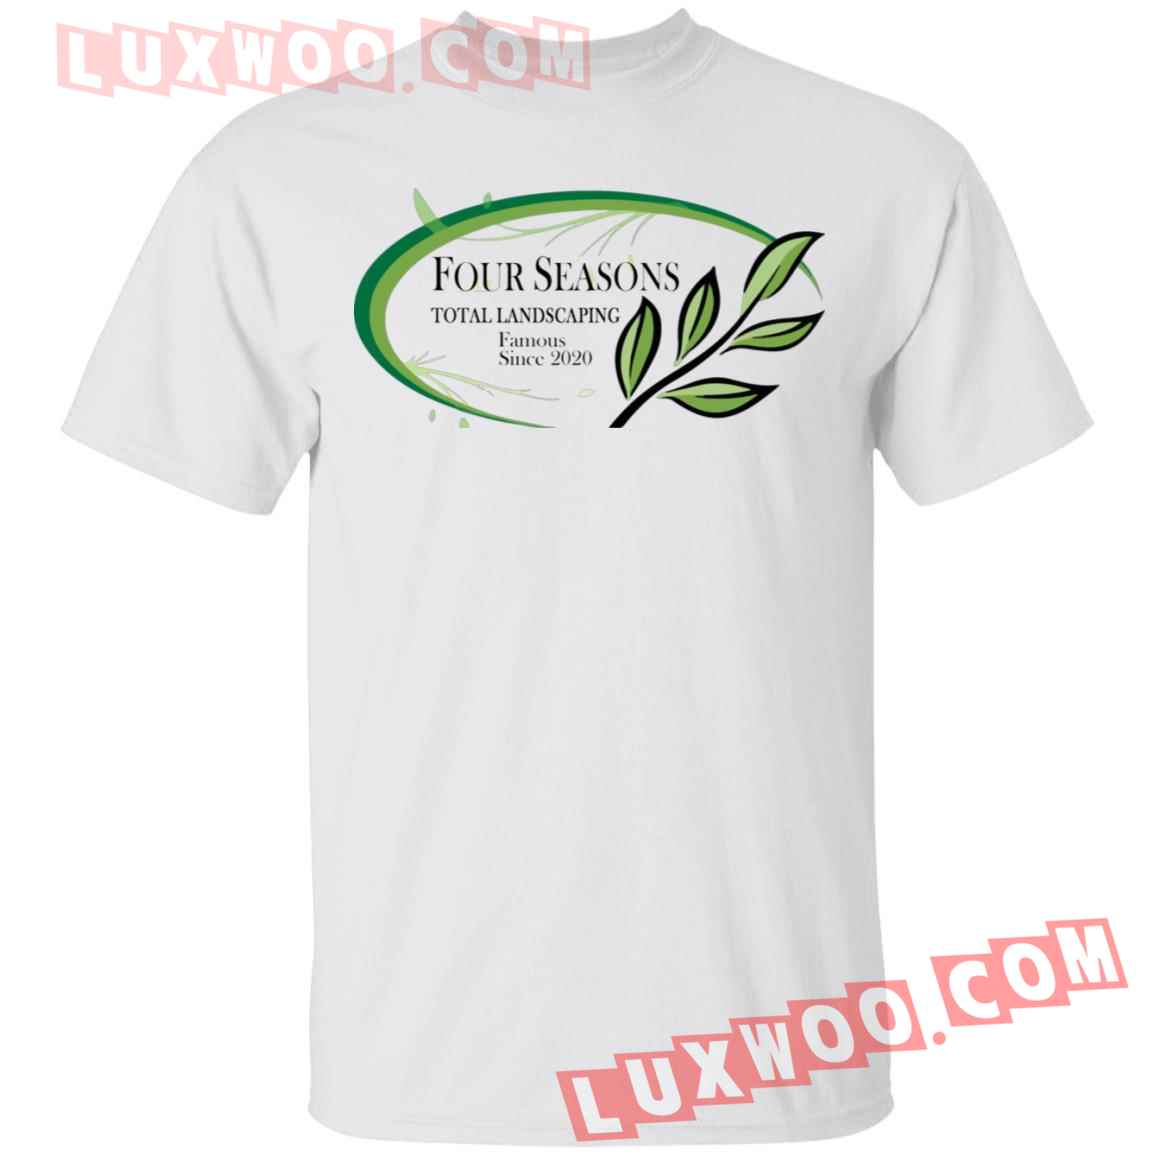 Four Seasons Total Landscaping Shirt